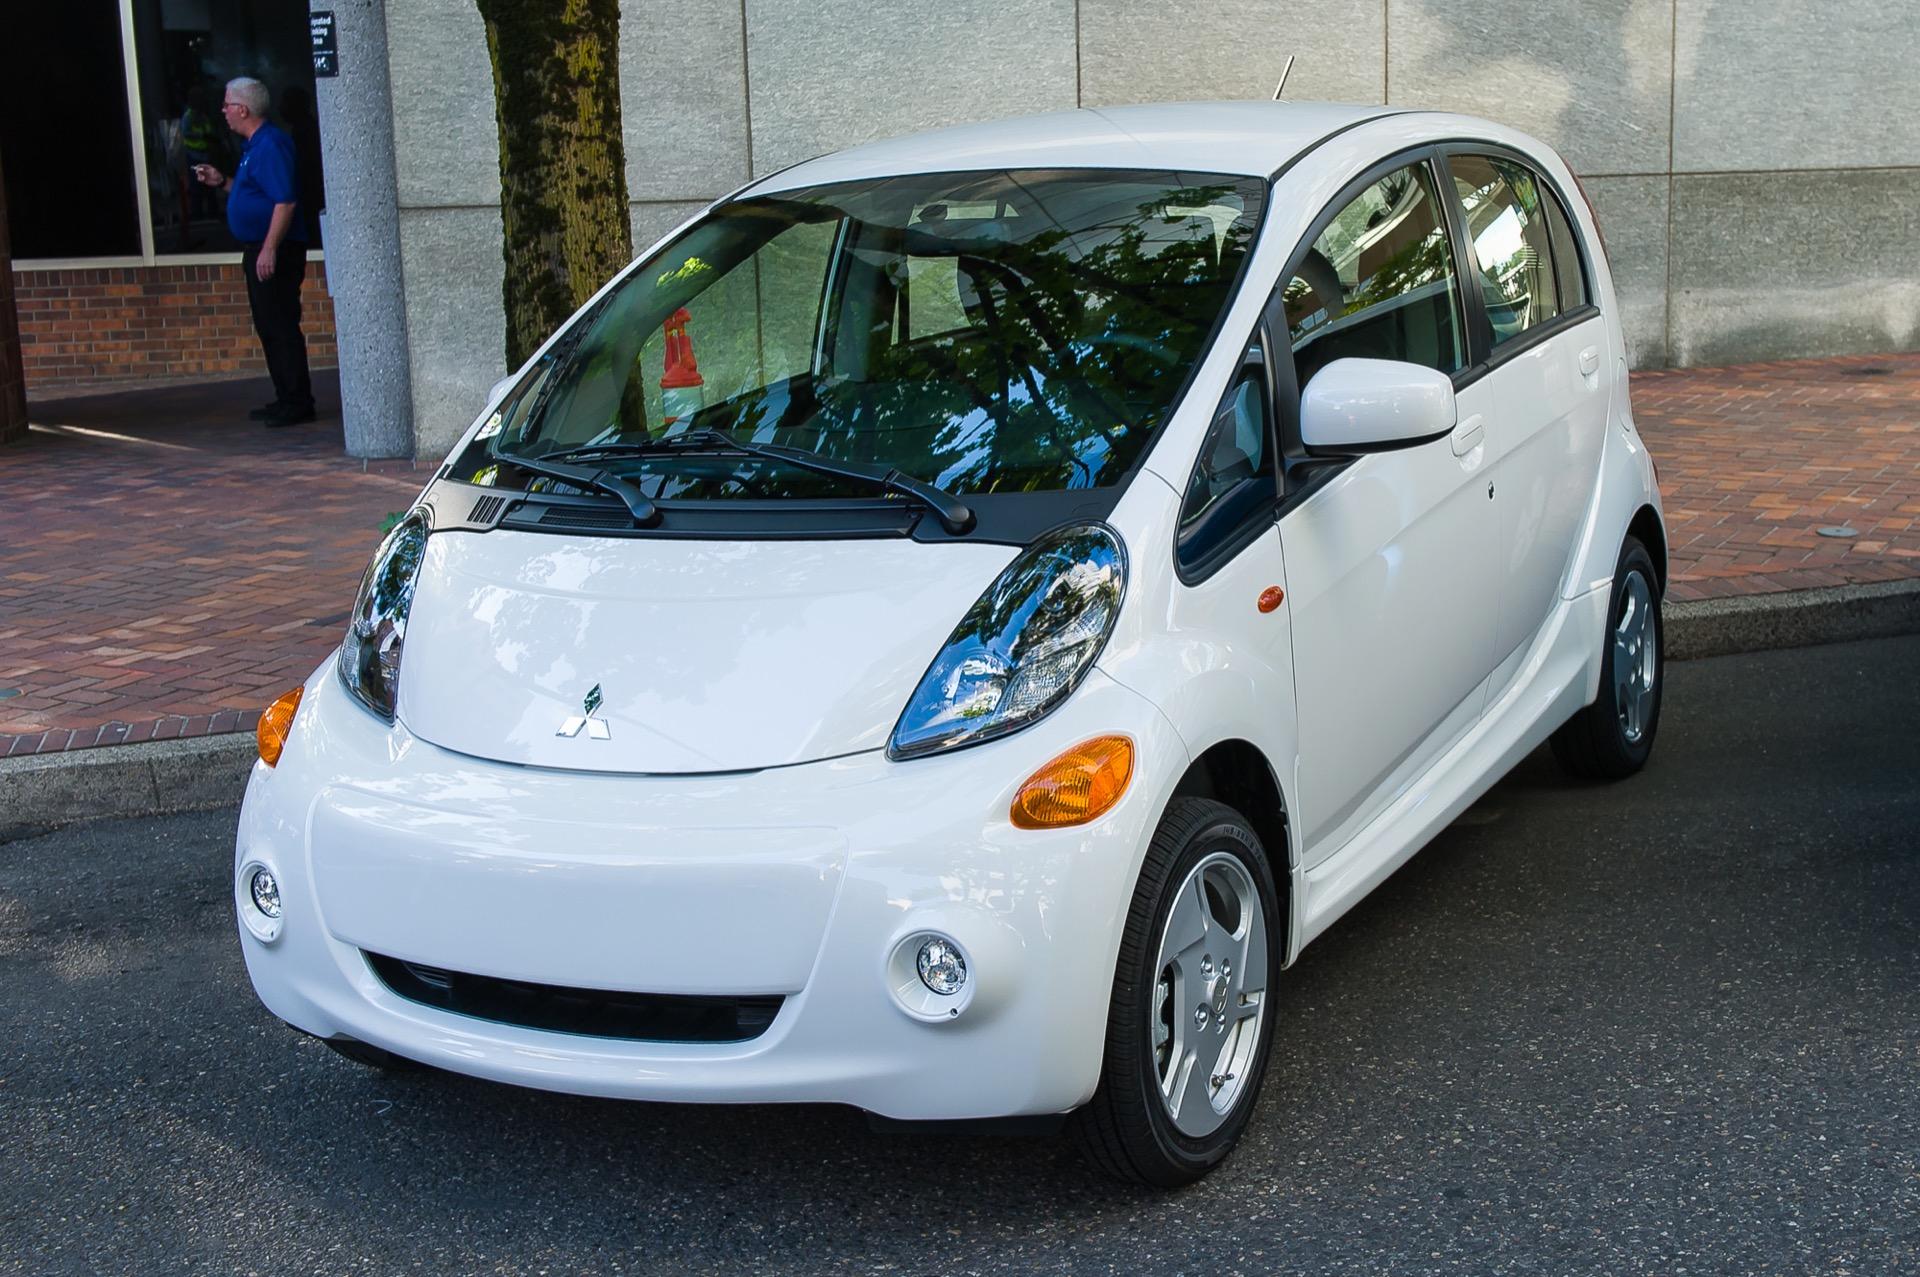 Mitsubishi i News : Breaking News, Photos, & Videos - Green Car